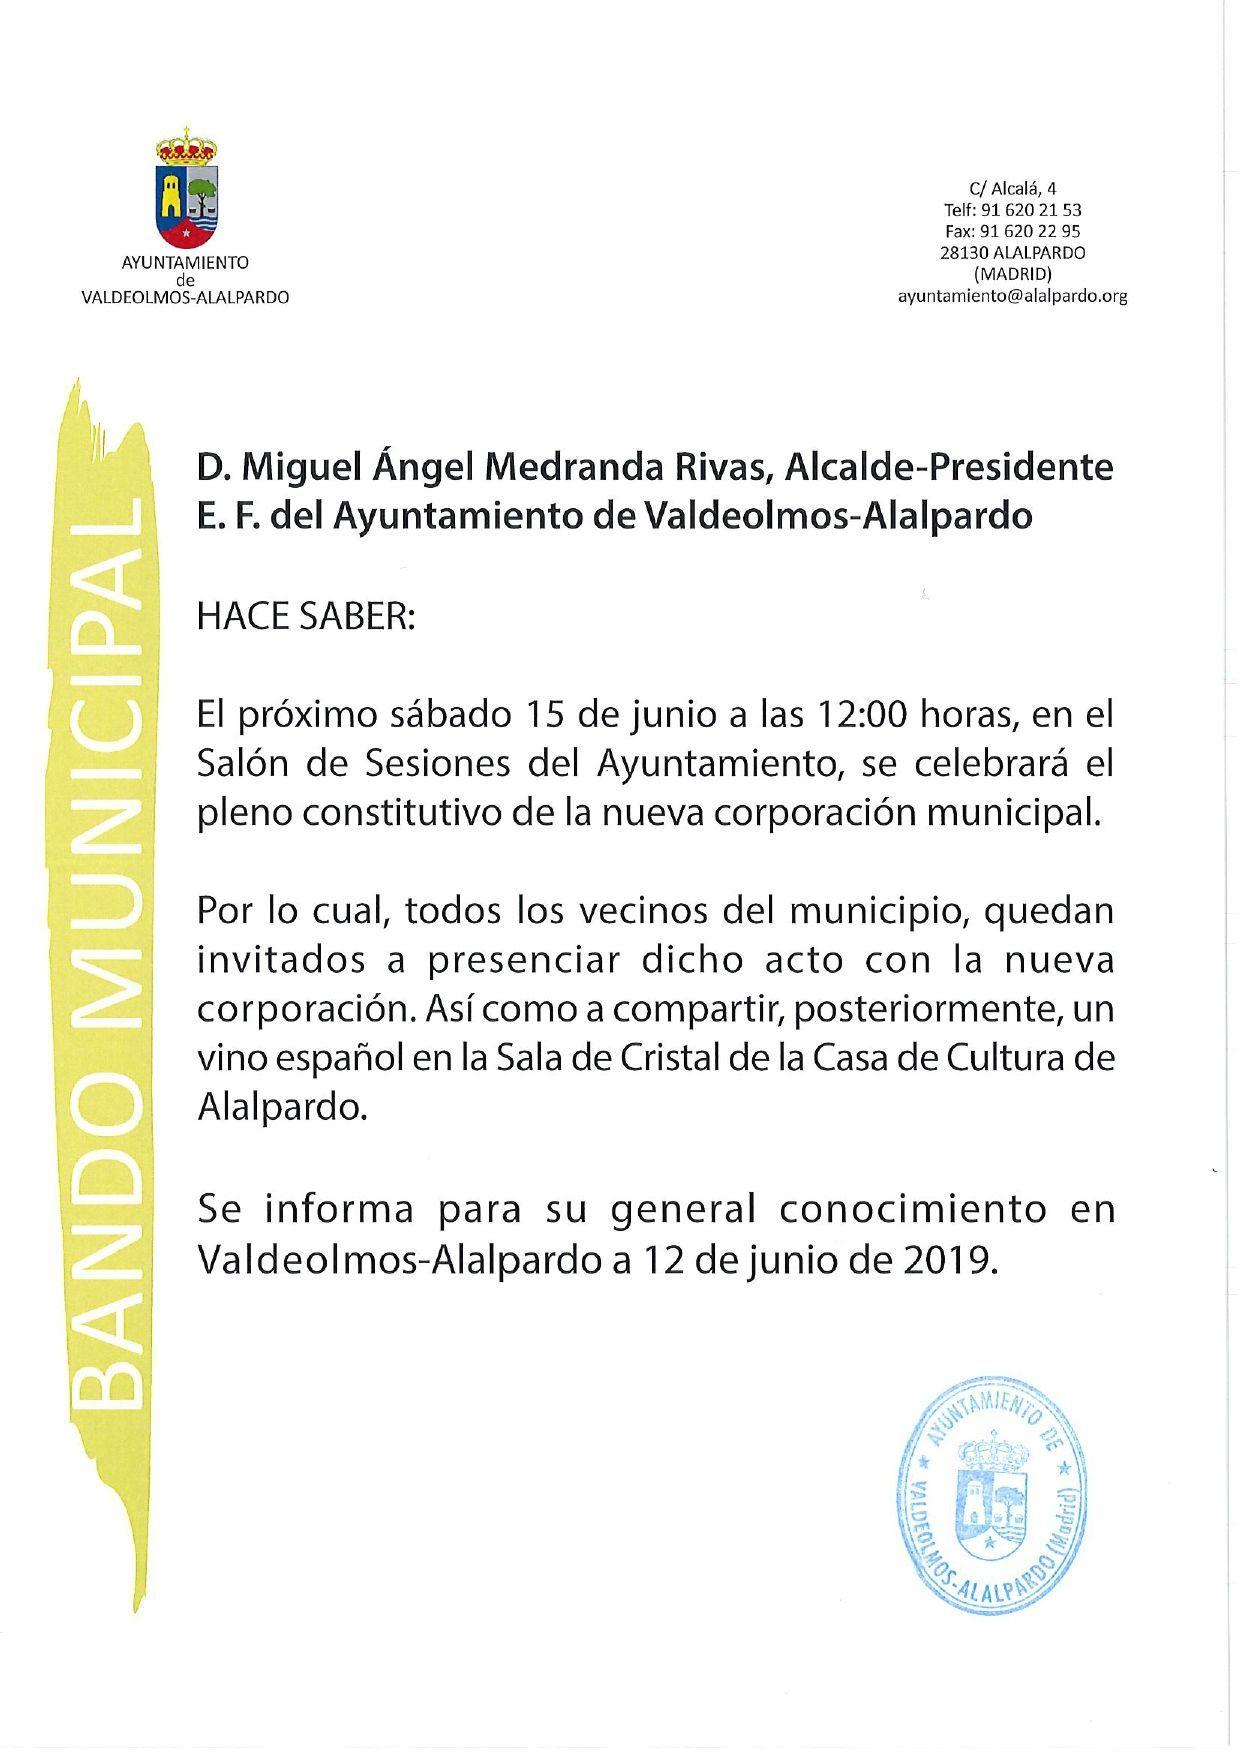 BANDO_Pleno Constitutivo Corporación Municipal_page-0001